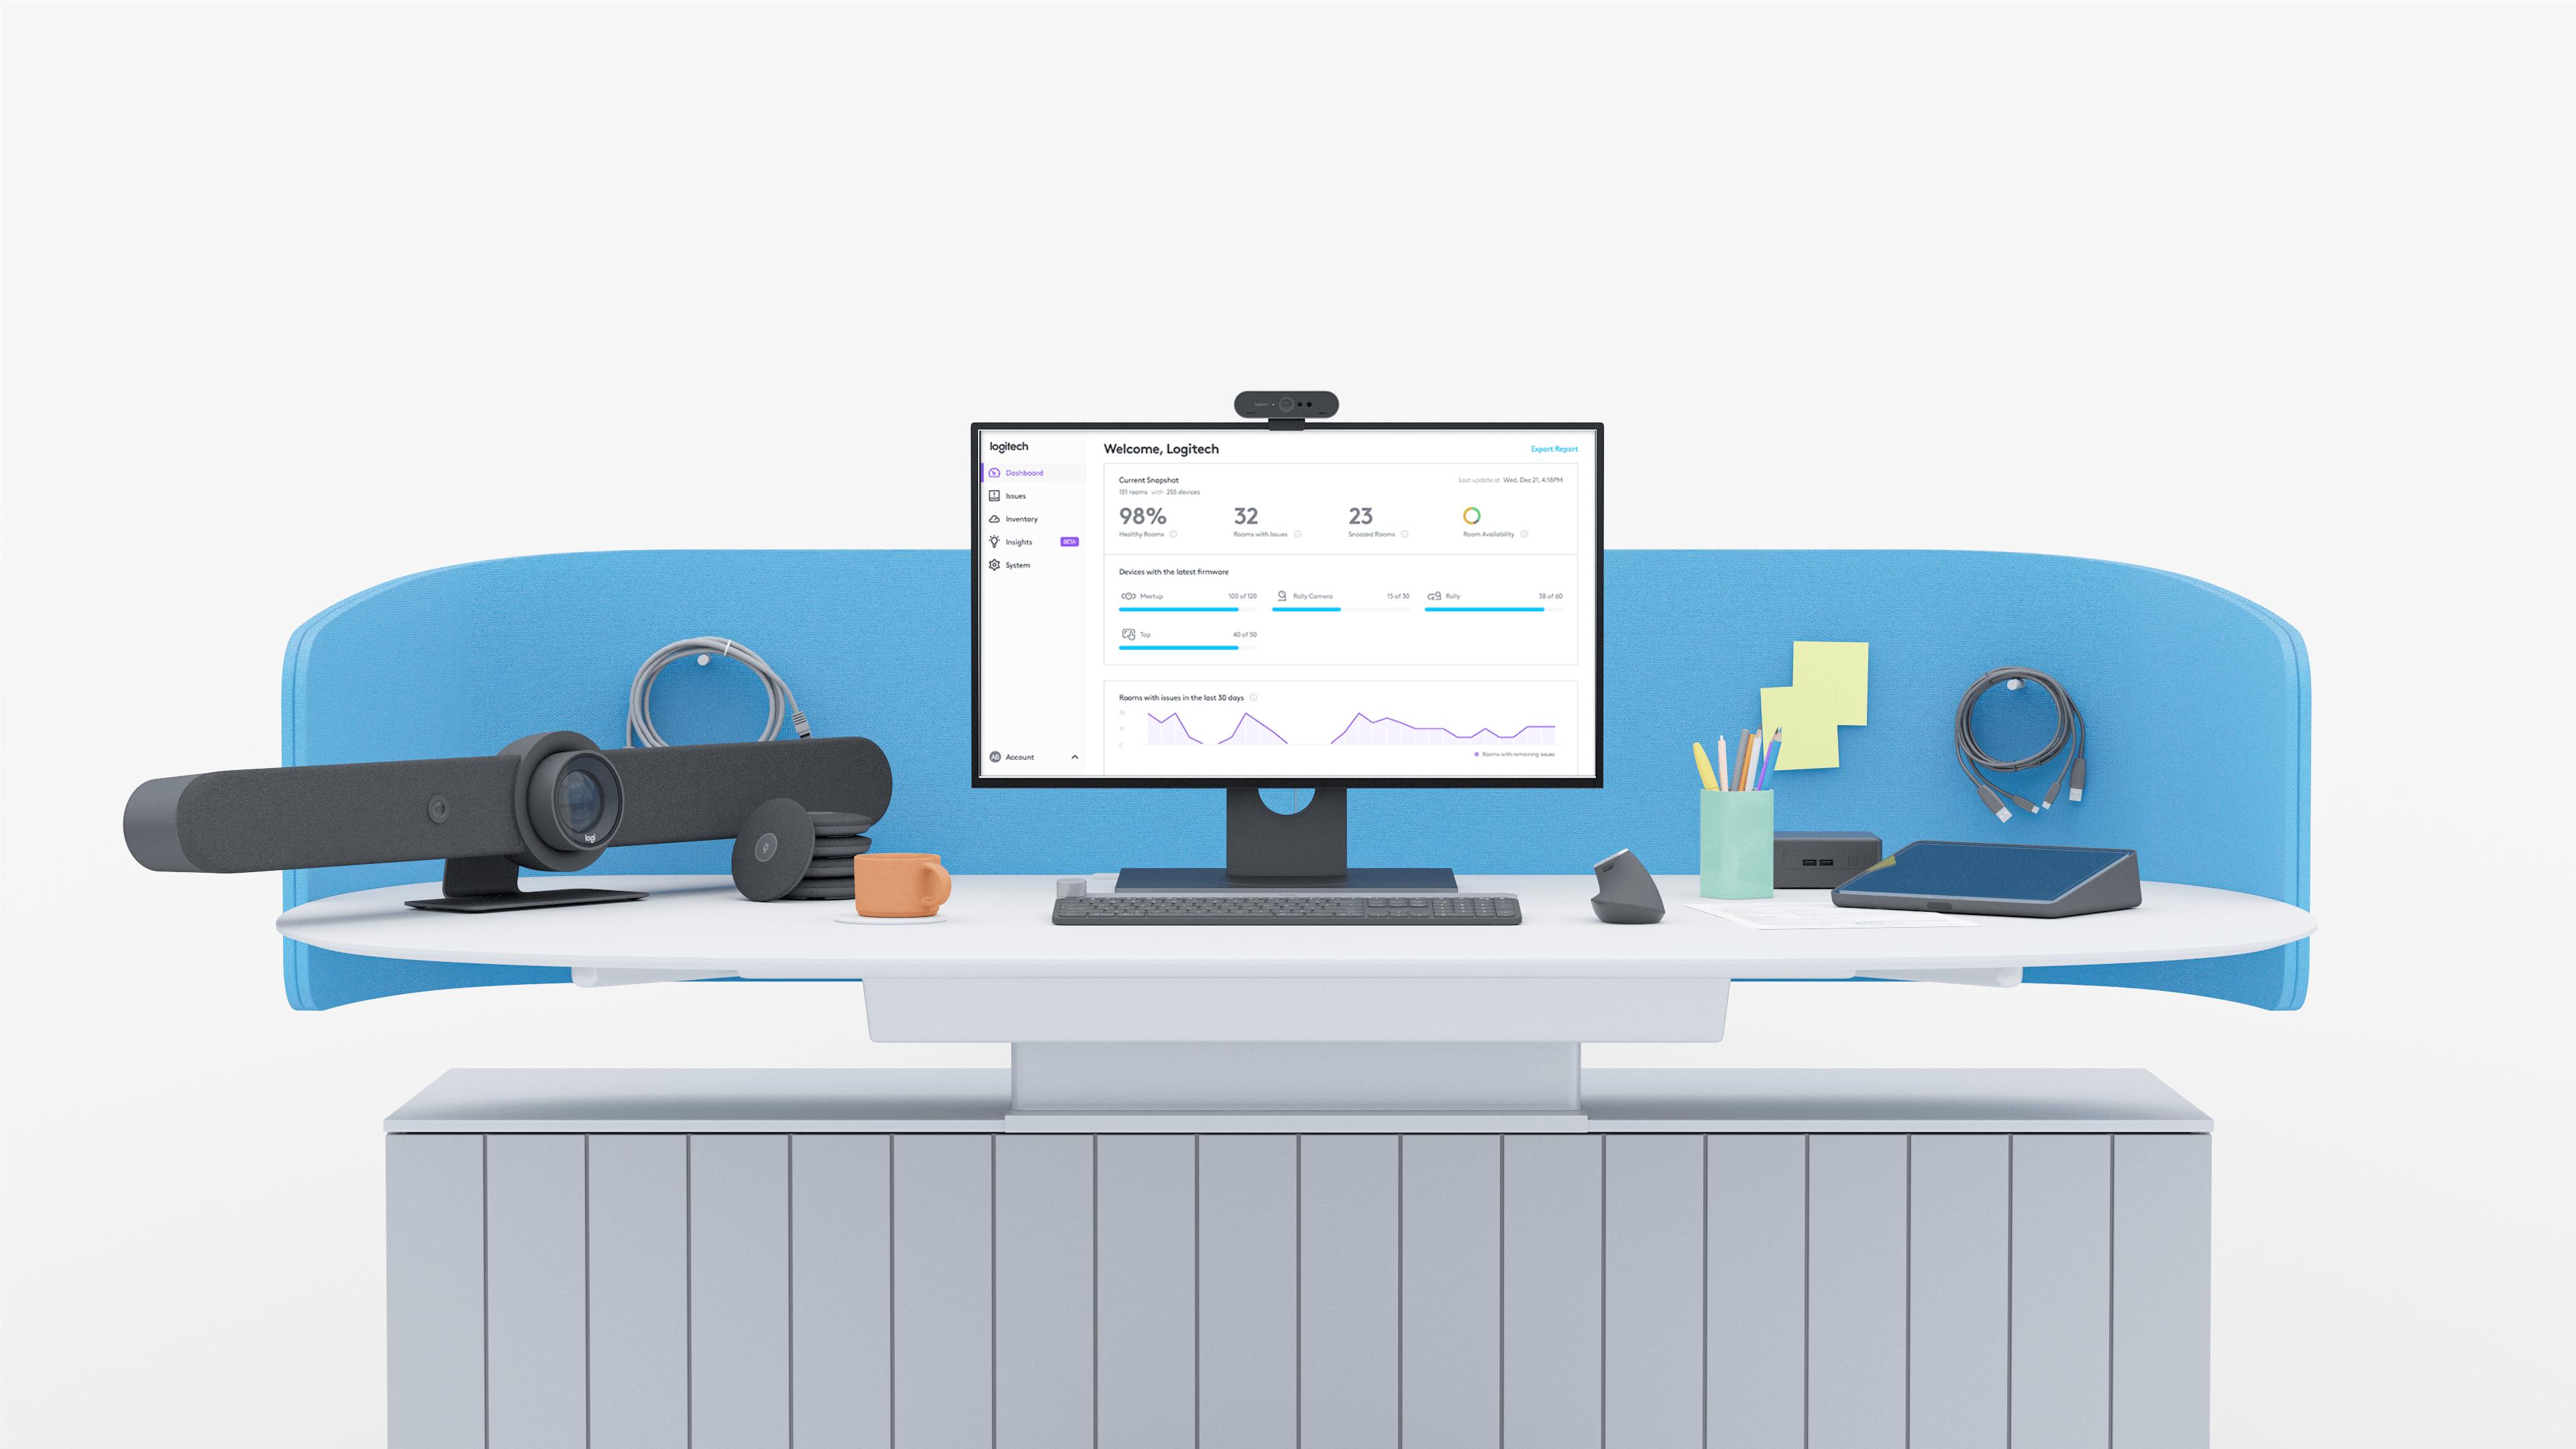 Illustration of Logitech Sync on a desktop computer screen